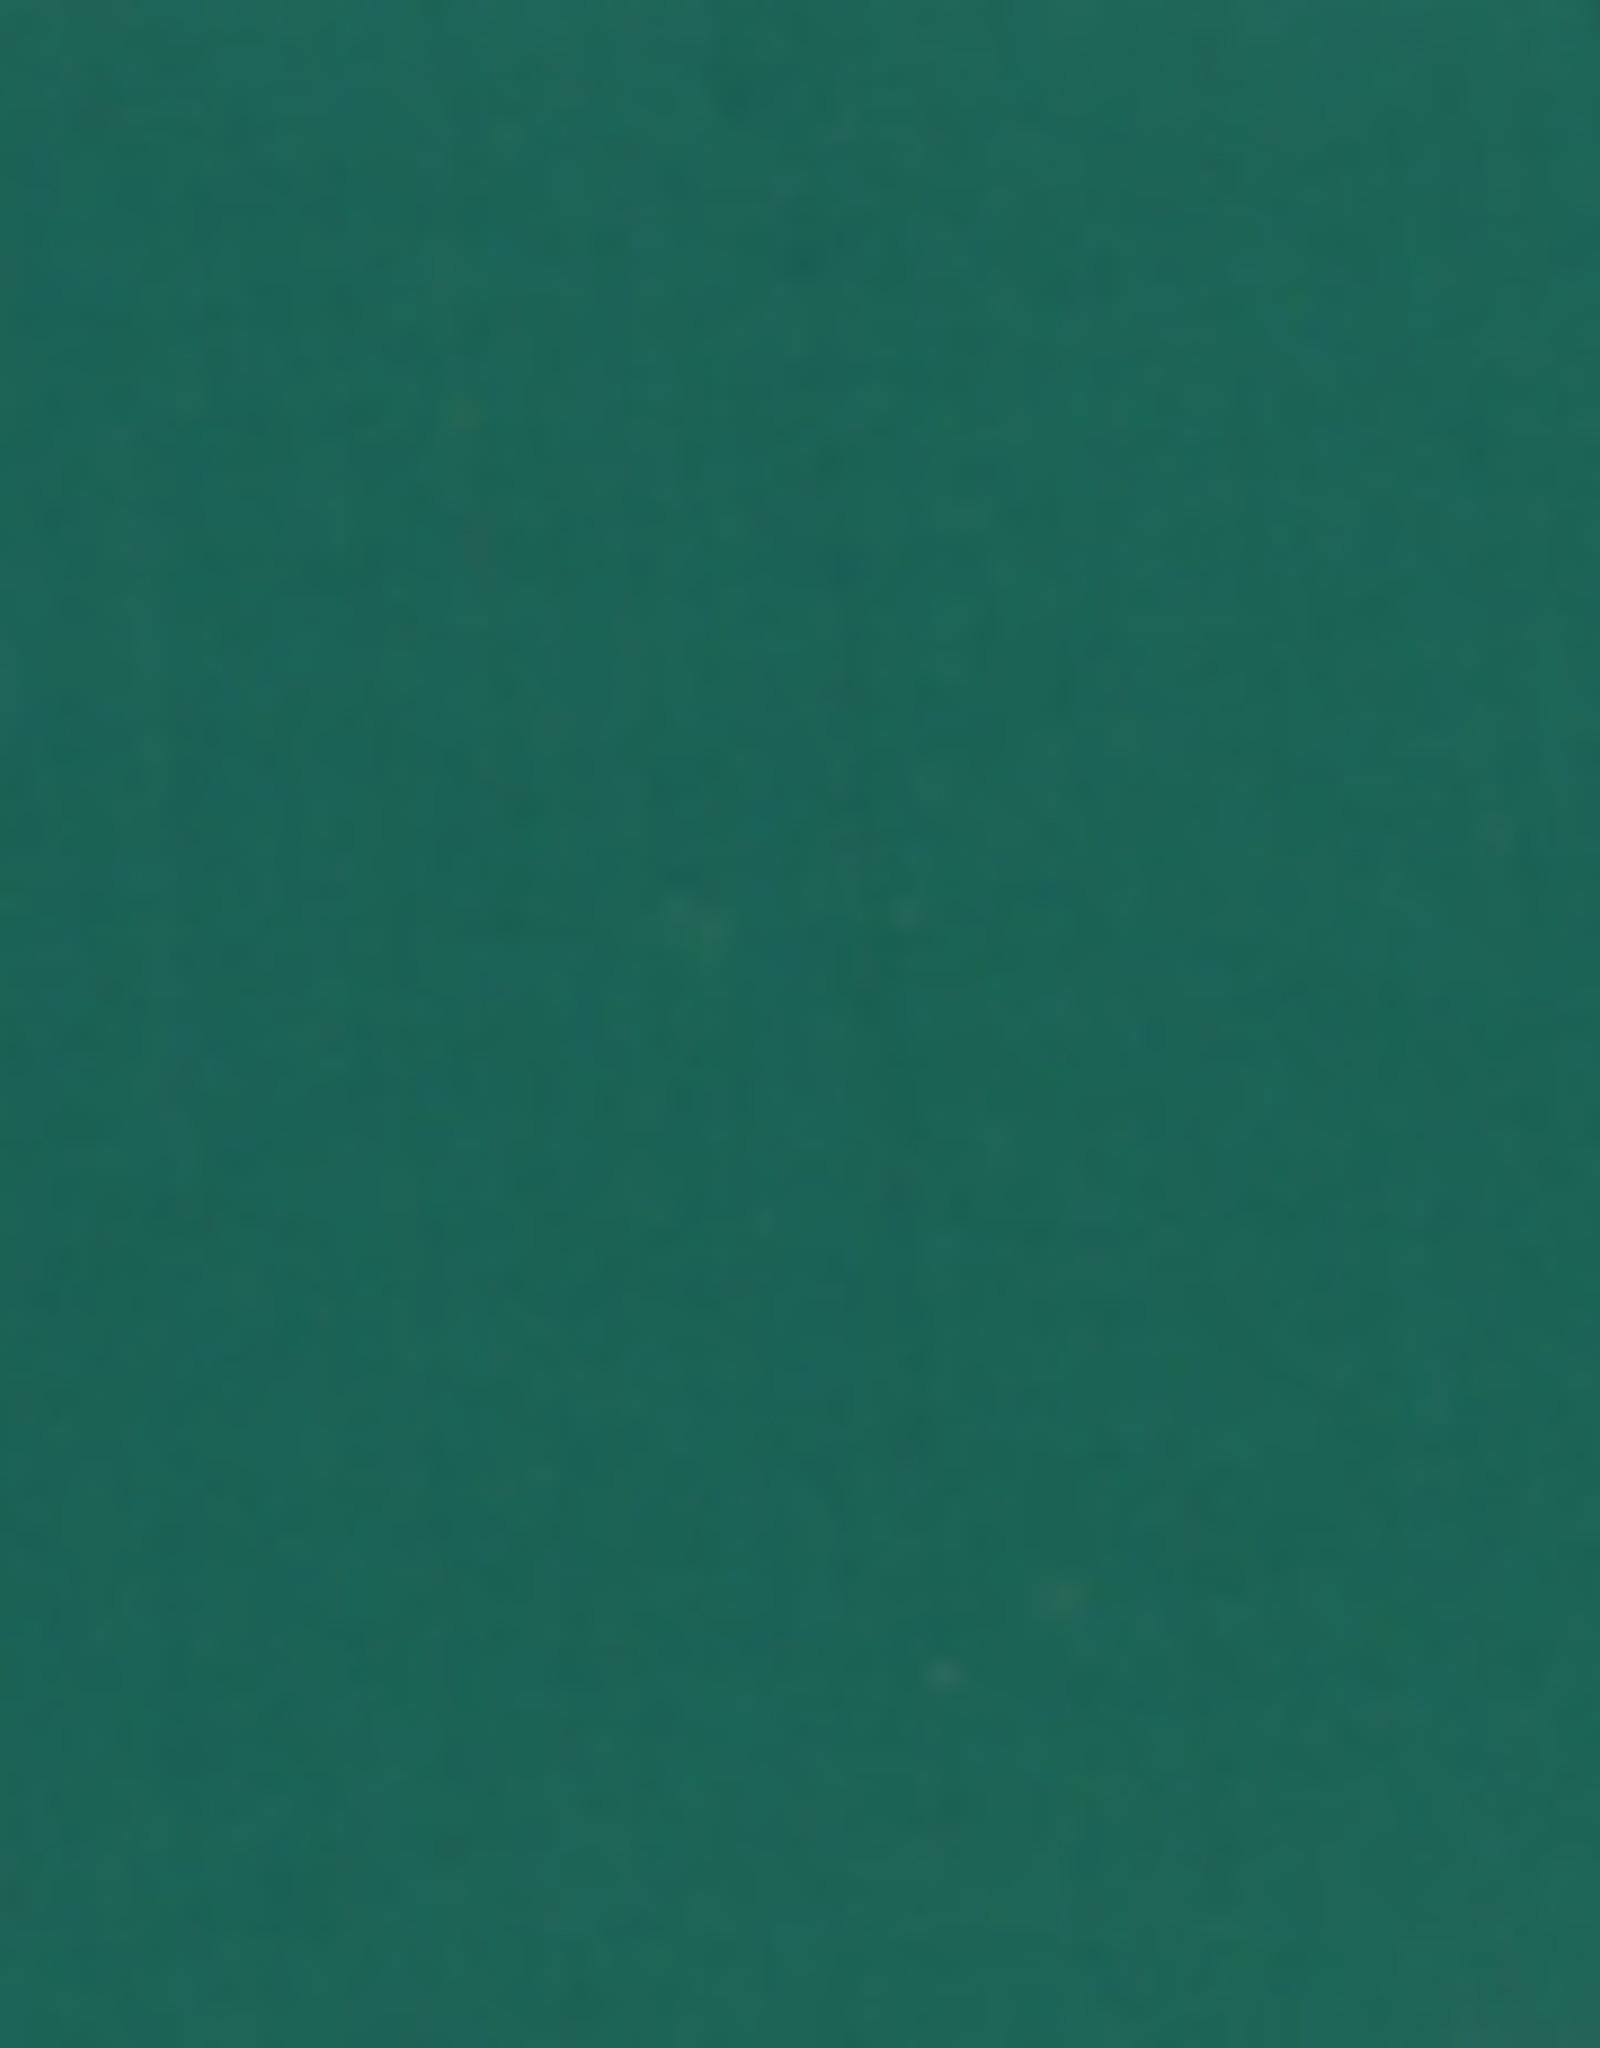 Holbein Gouache Series A Permanent Green Deep 15 ml